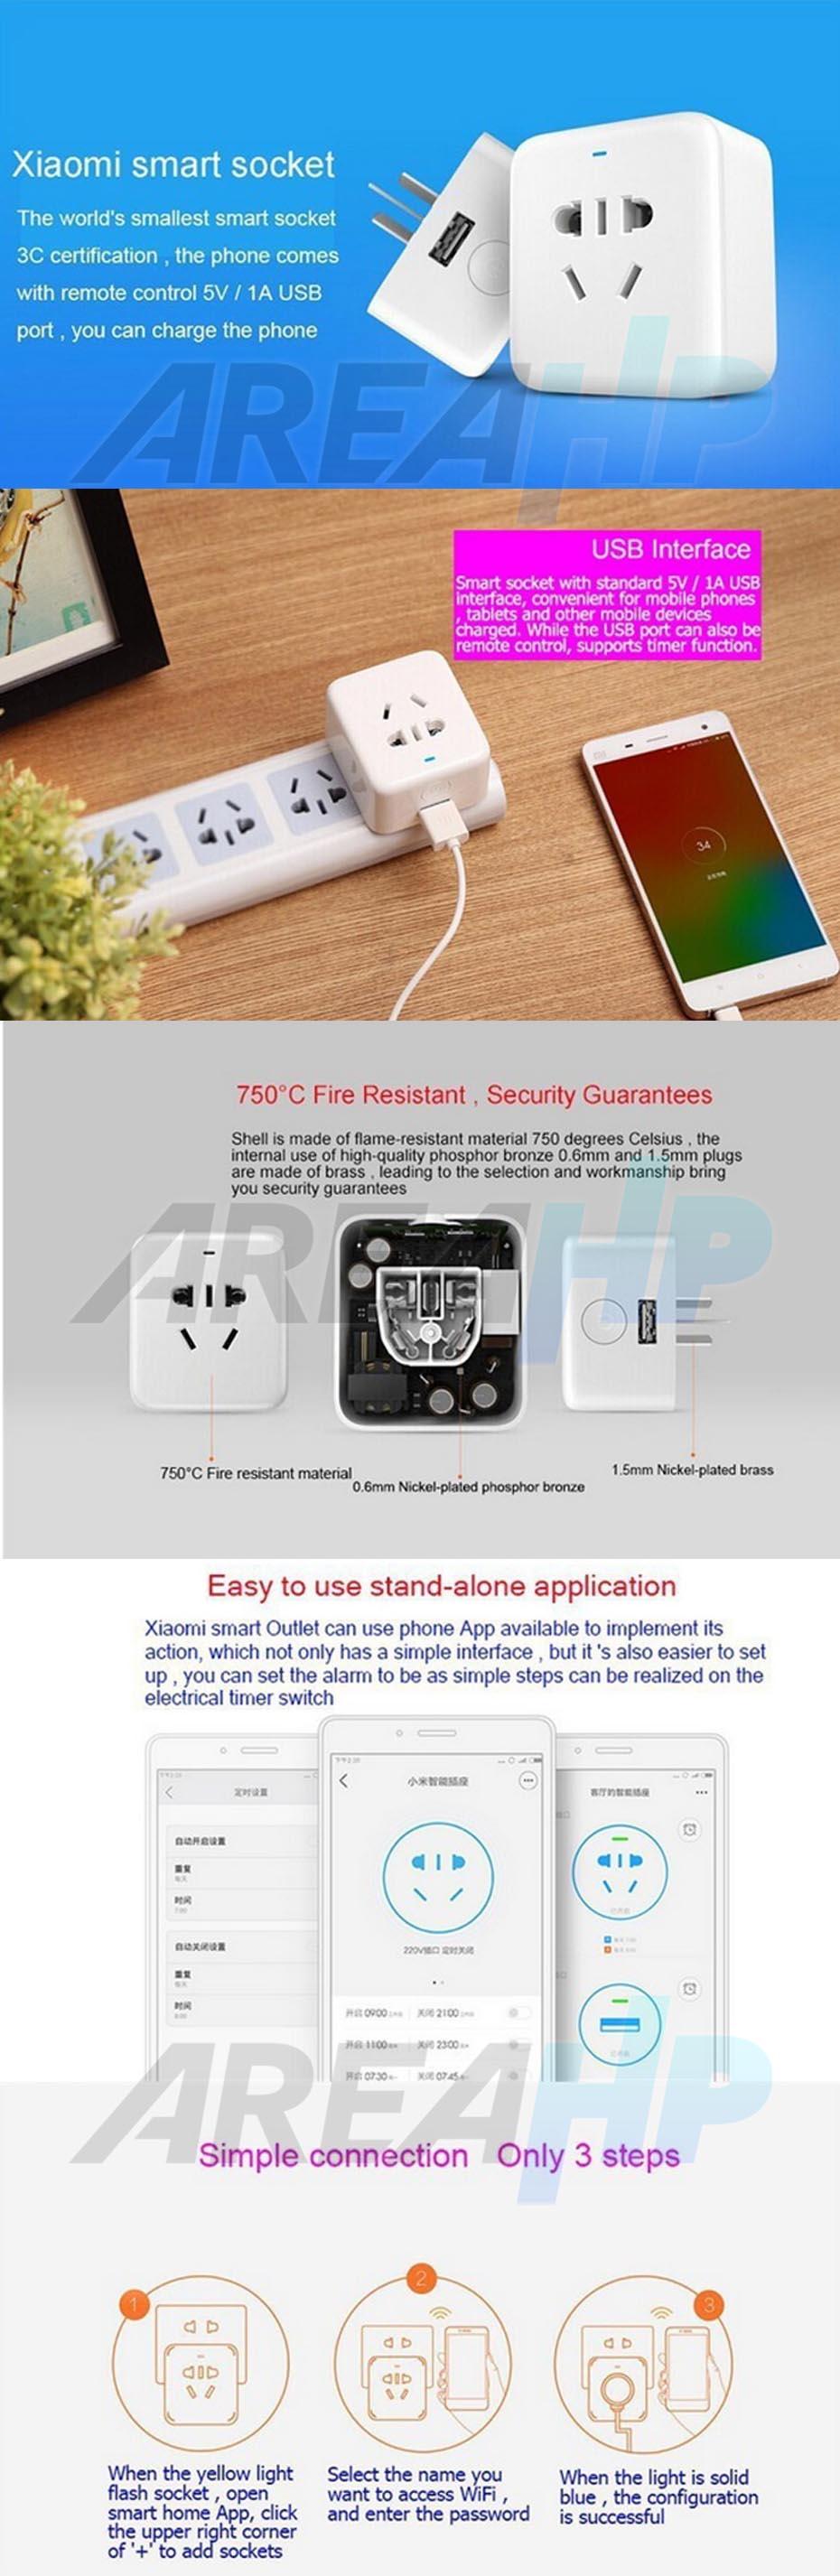 Xiaomi Intelligent Wireless Remote Control Smart Socket Original Overview